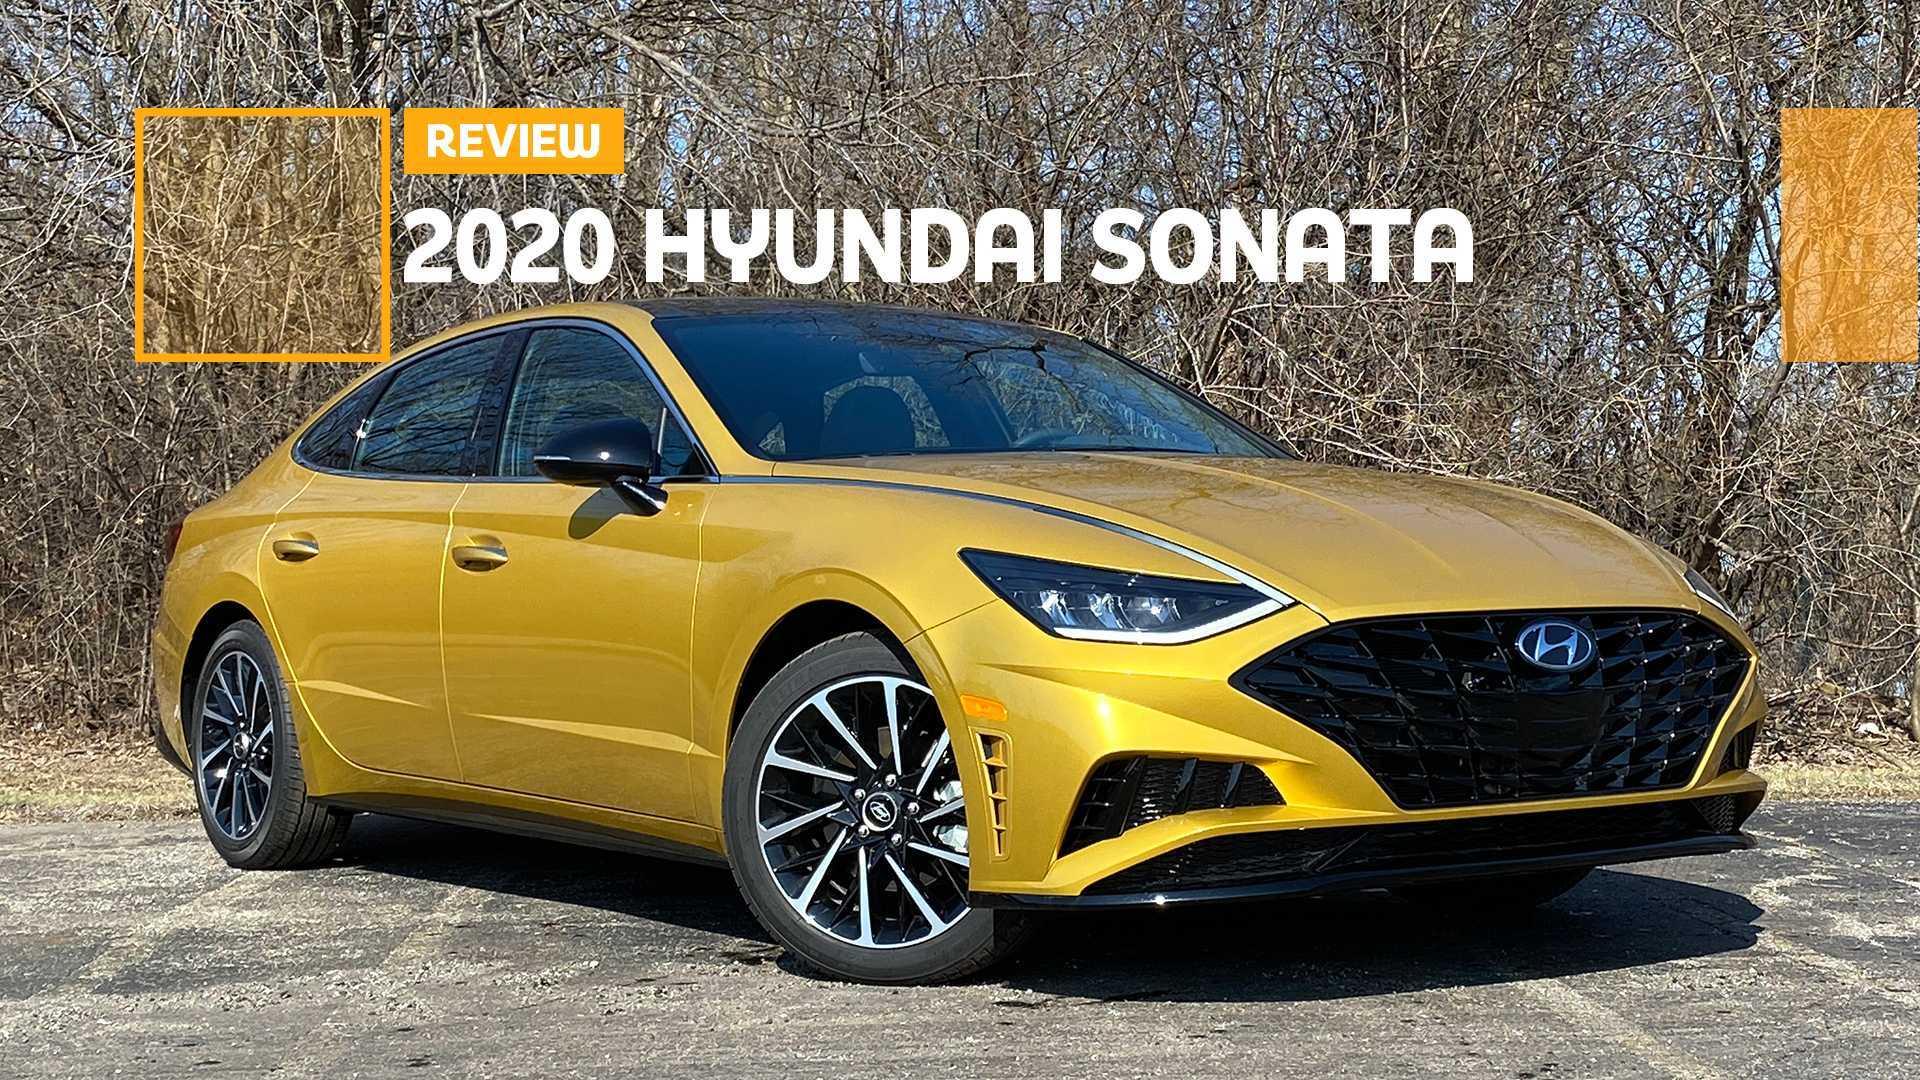 2020 Hyundai Sonata Sel Plus Review Resurgent